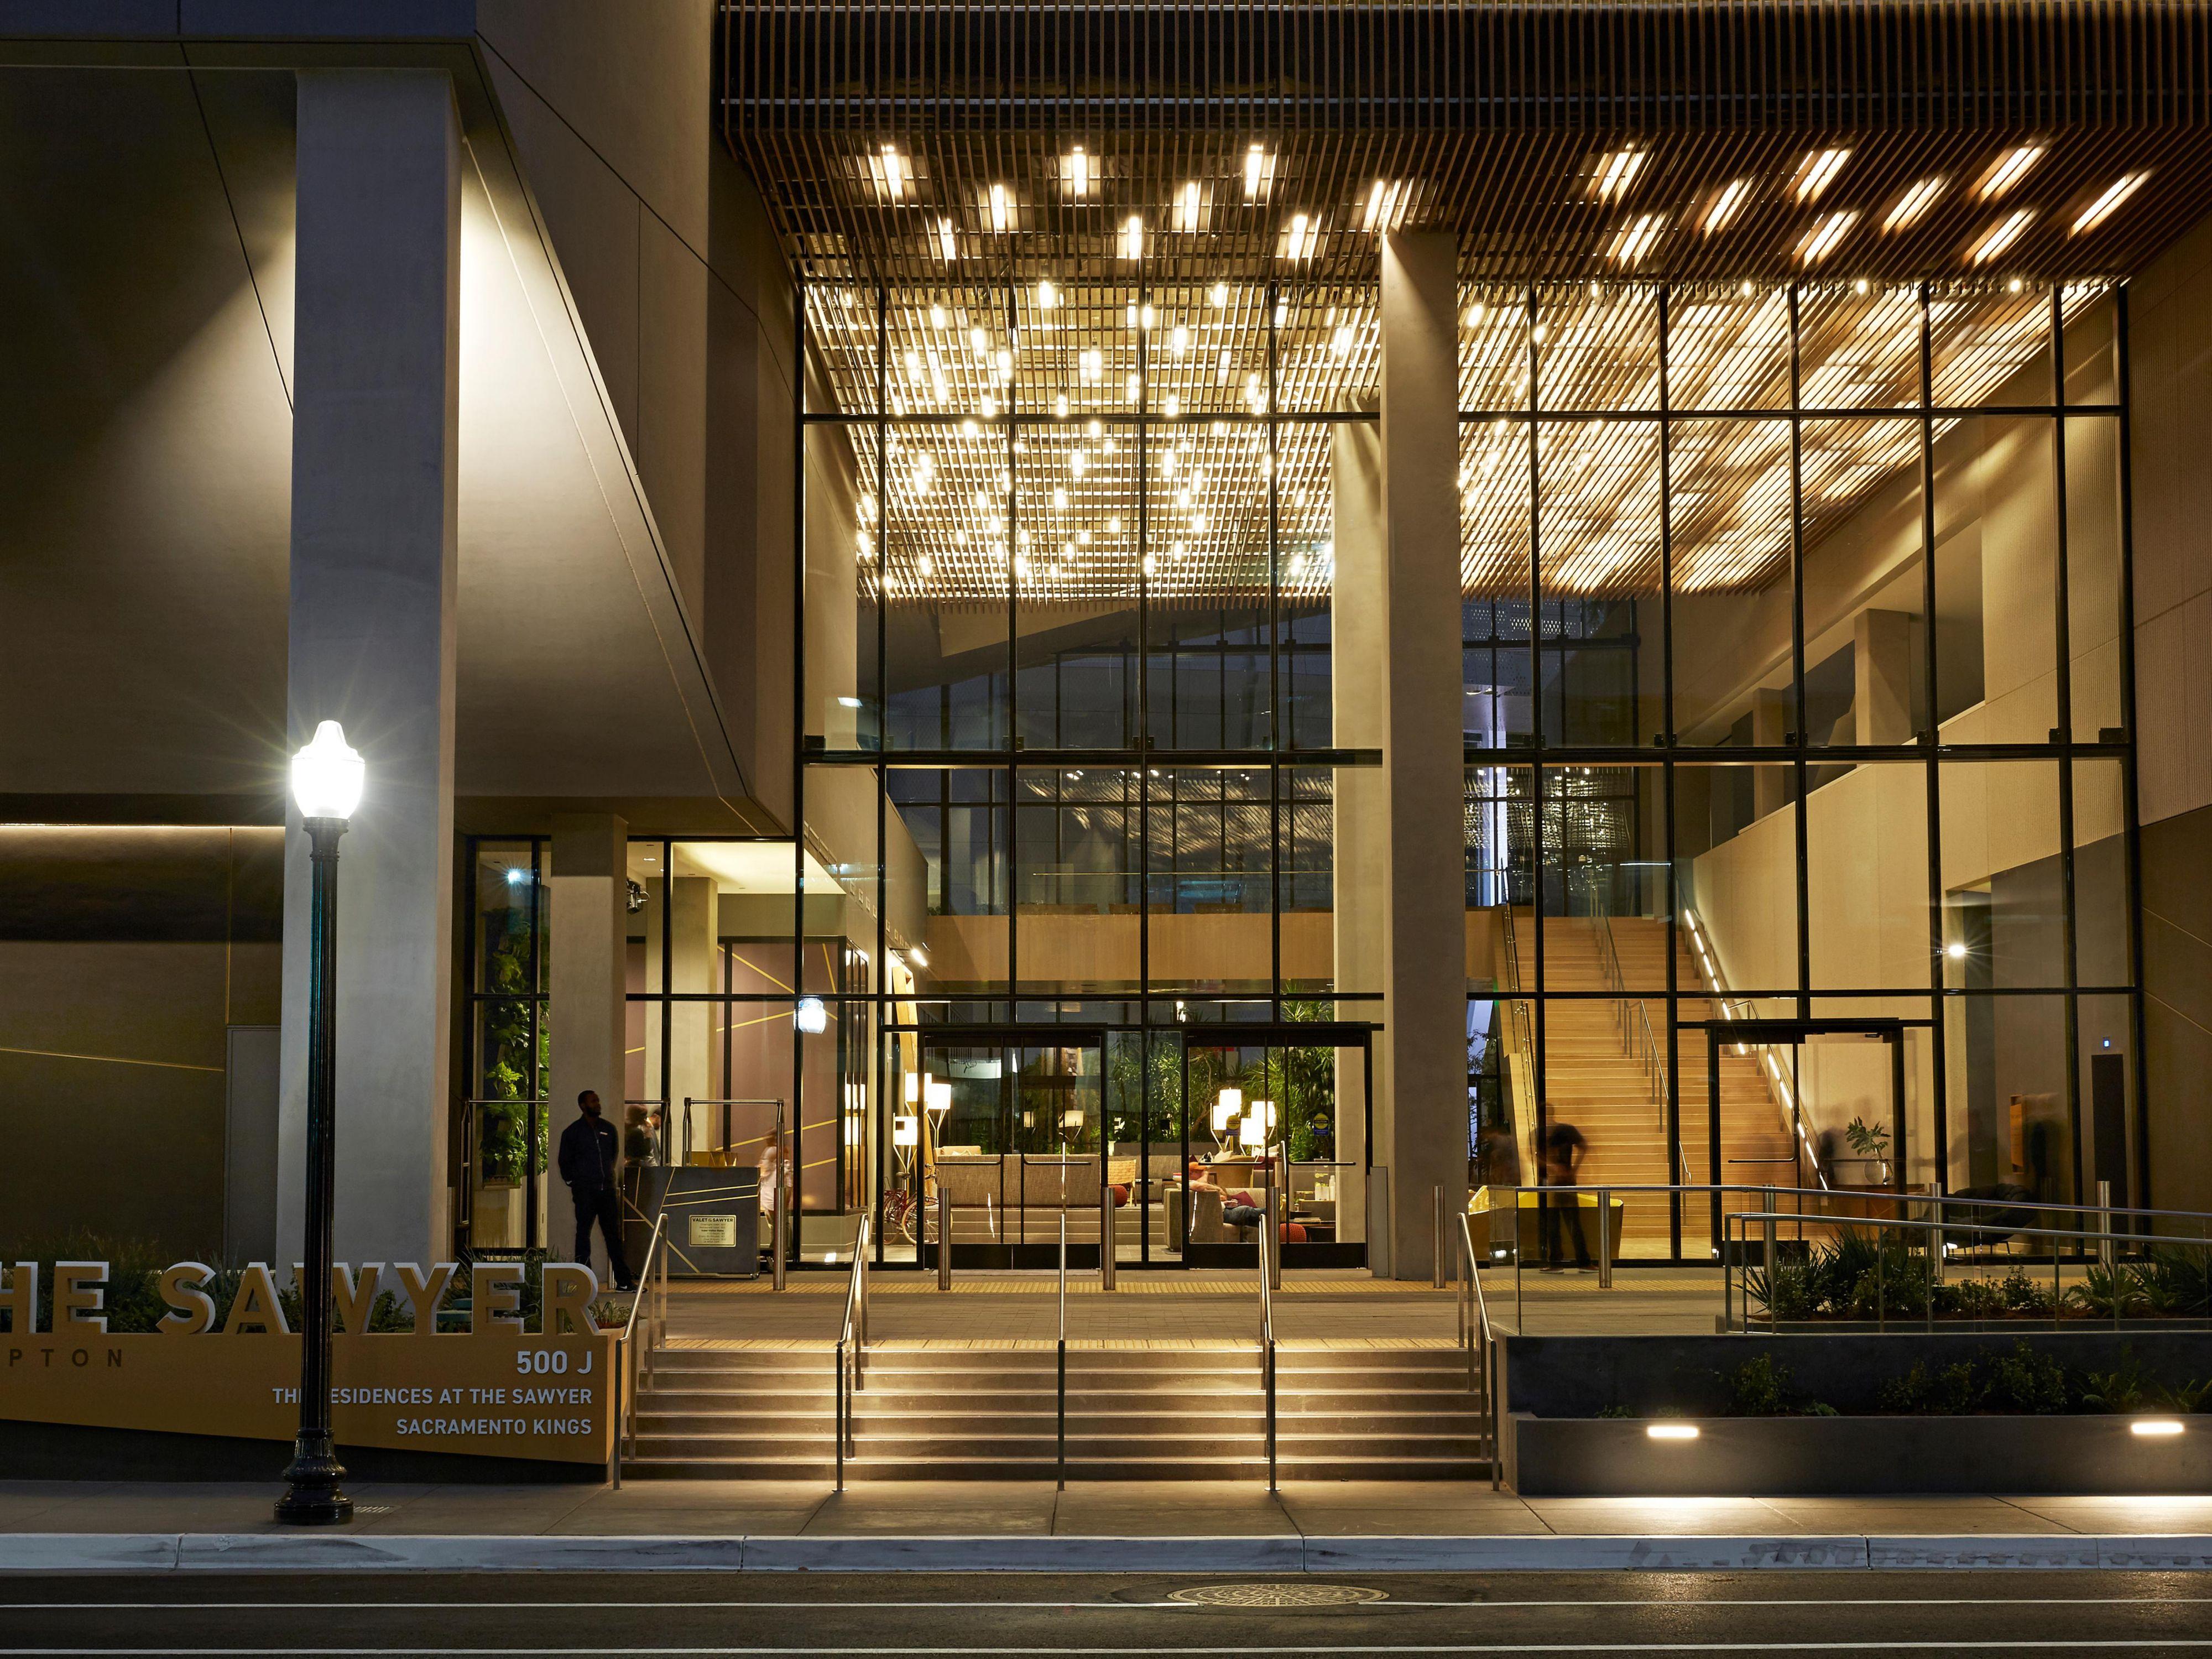 Kimpton Sawyer Hotel - Book your stay in Sacramento